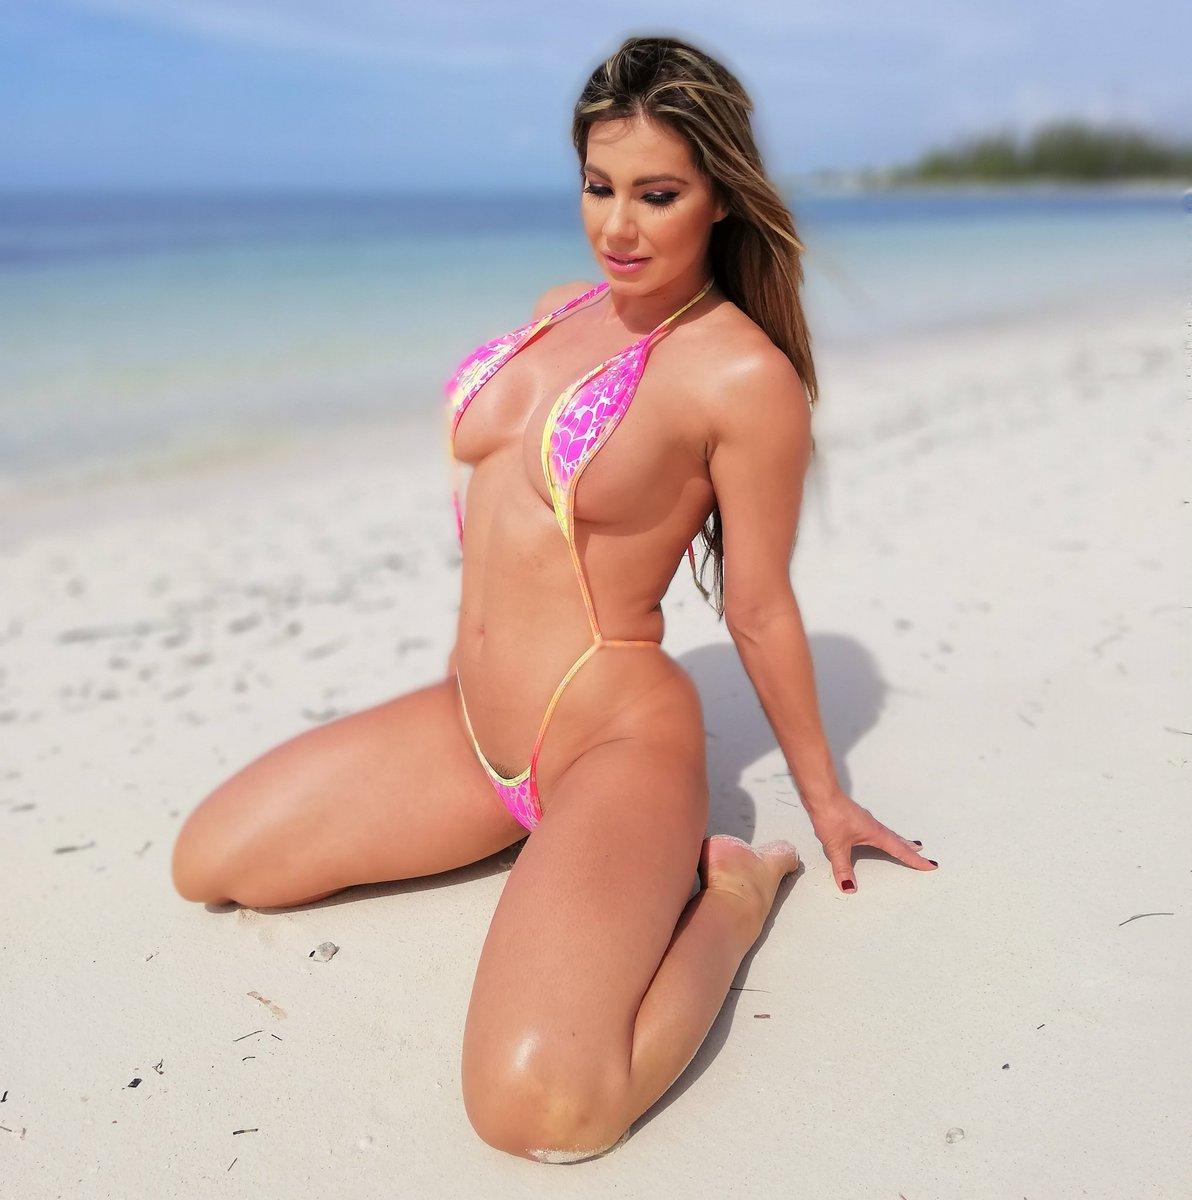 Bikini Esperanza Gomez nudes (78 photos), Sexy, Bikini, Feet, lingerie 2020